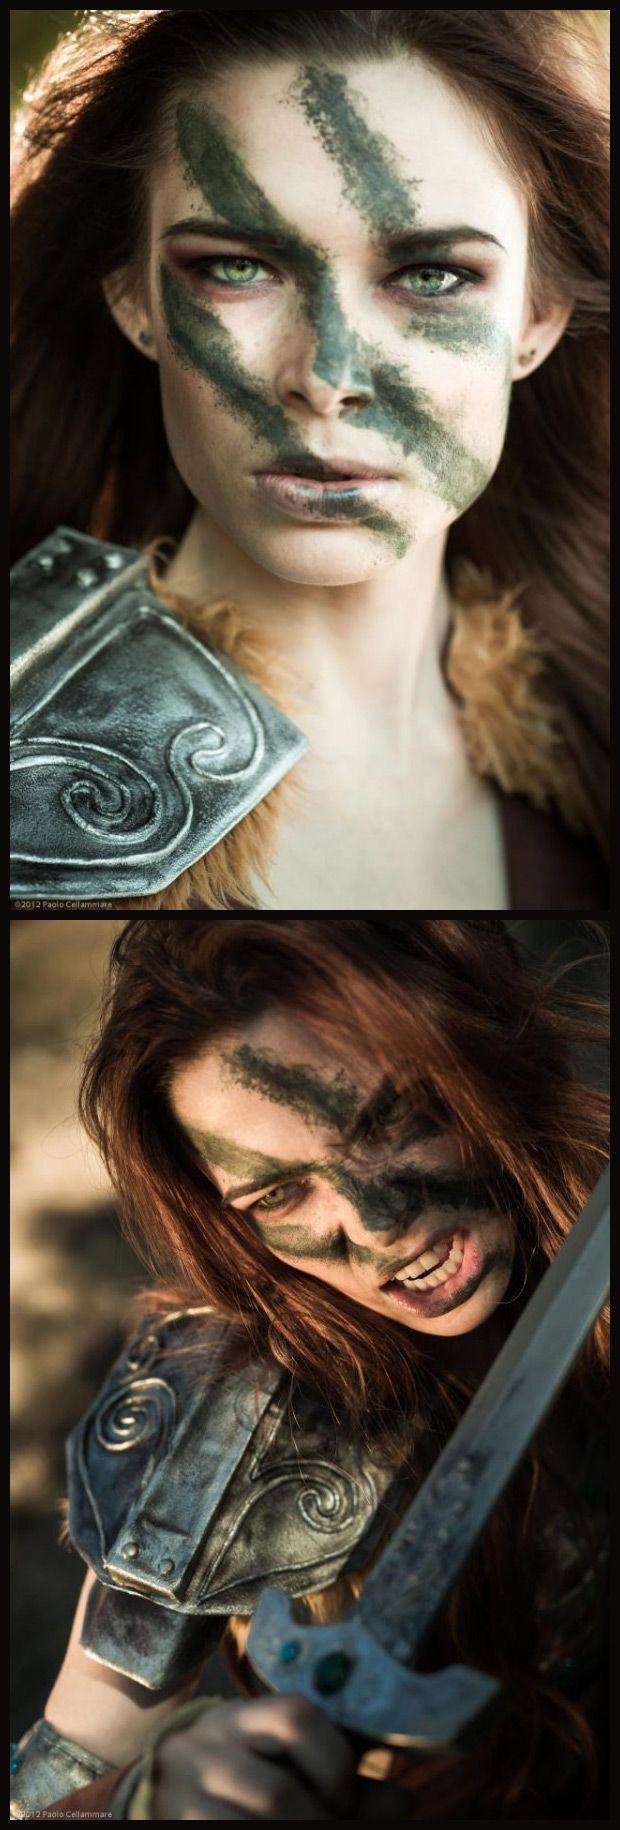 Chloe Dykstra looks a lot like Skyrim's Aela The Huntress